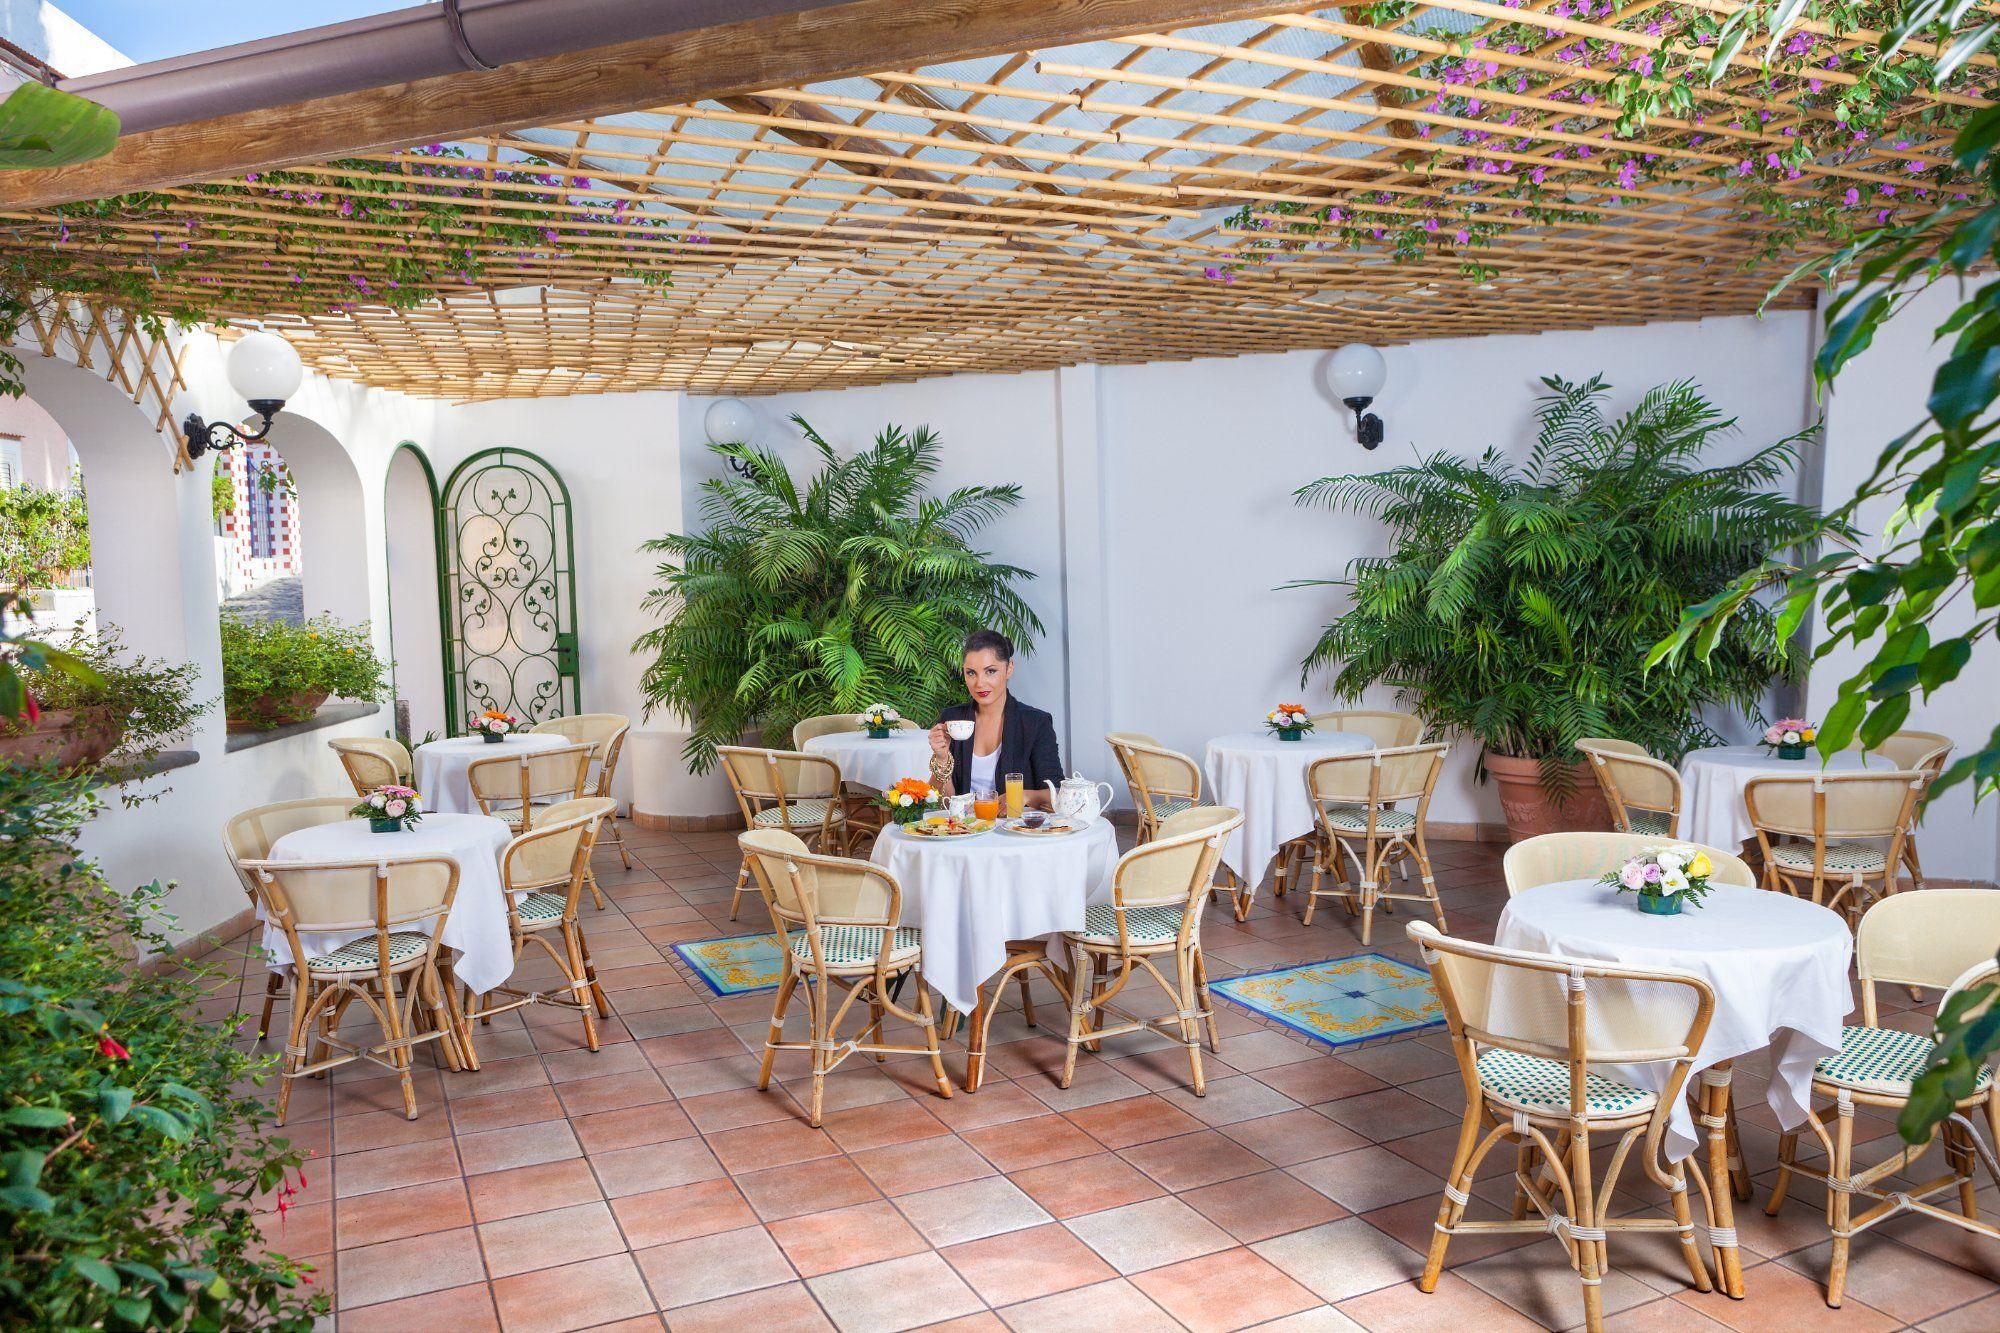 Hotel Villa Sirena (Isola d'Ischia/Casamicciola Terme